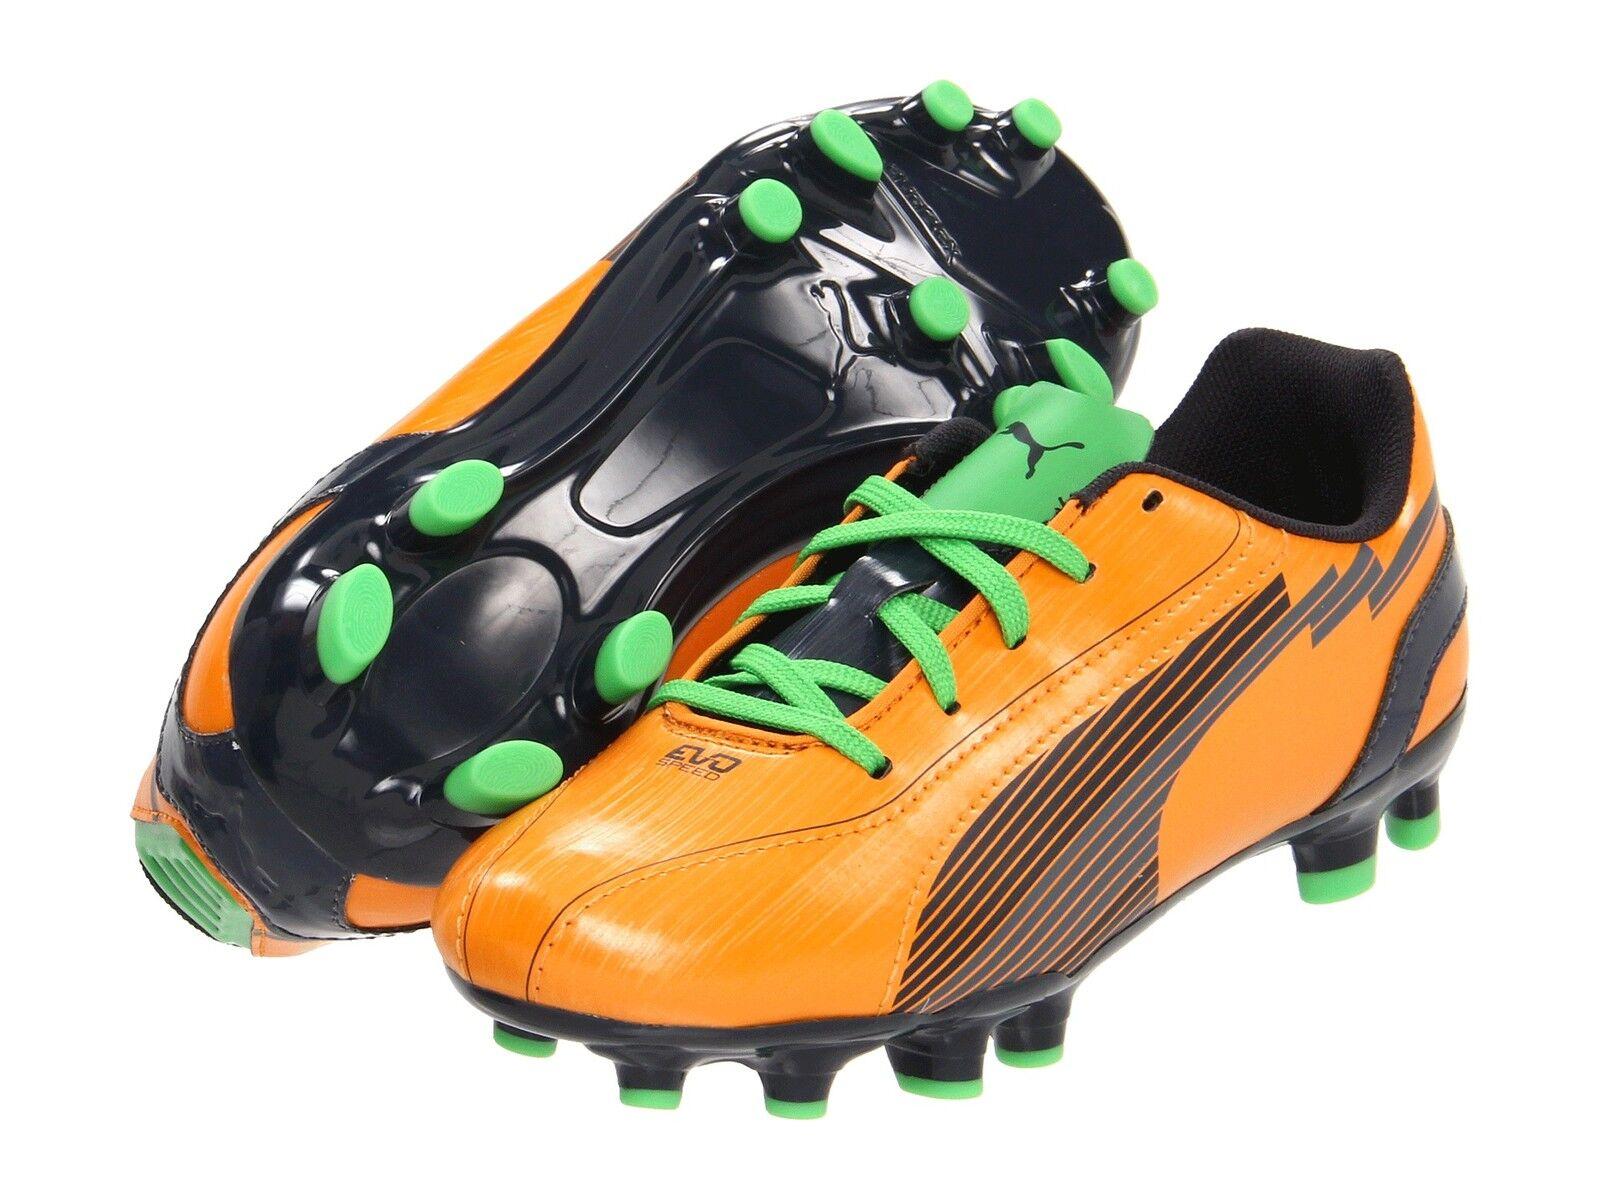 Puma eVoSpeed 5 FG Soccer Schuhes Orange / Grün Kids Youth Jr Brand New